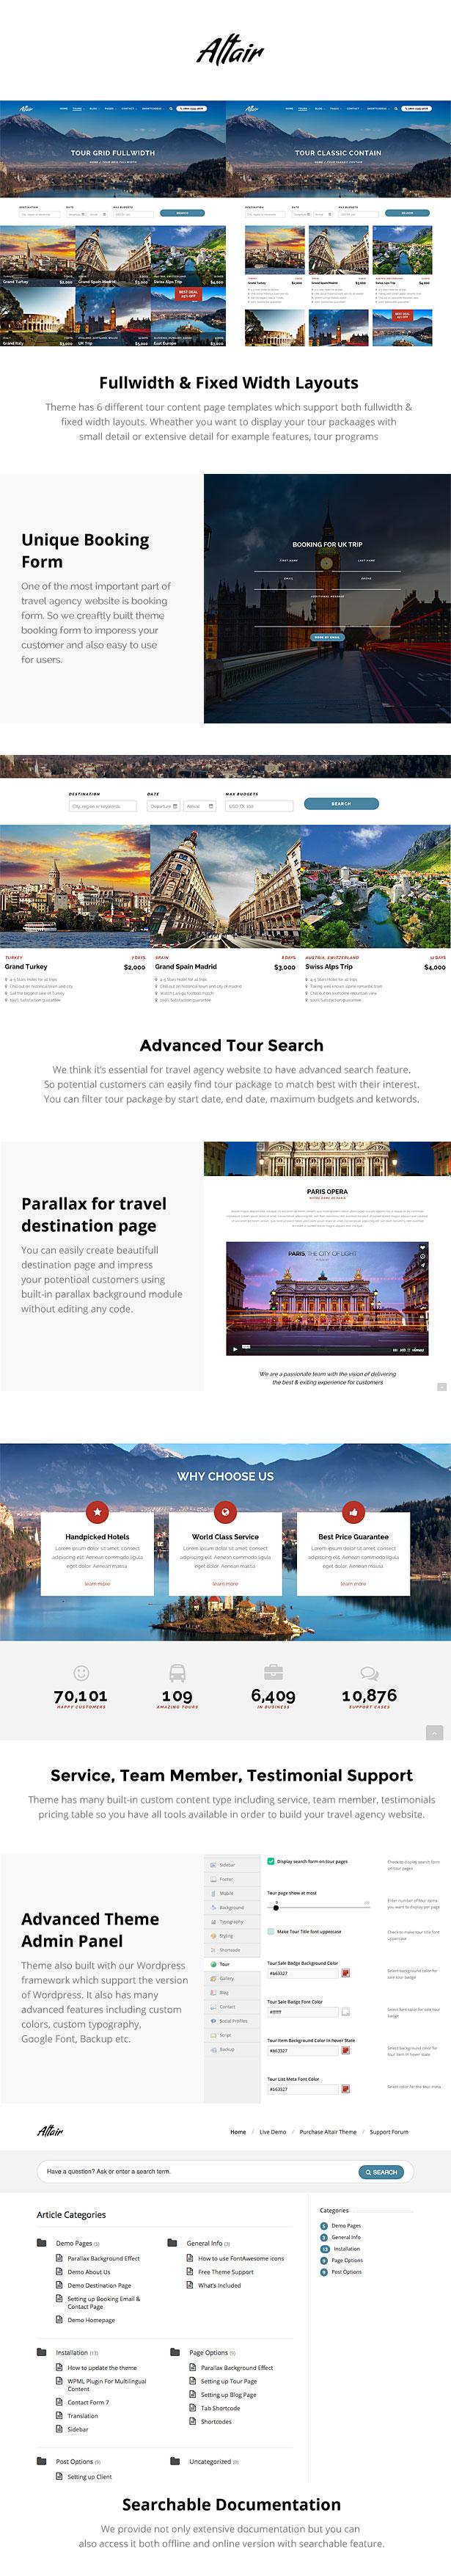 AltairFeatures - Altair | Travel Agency WordPress